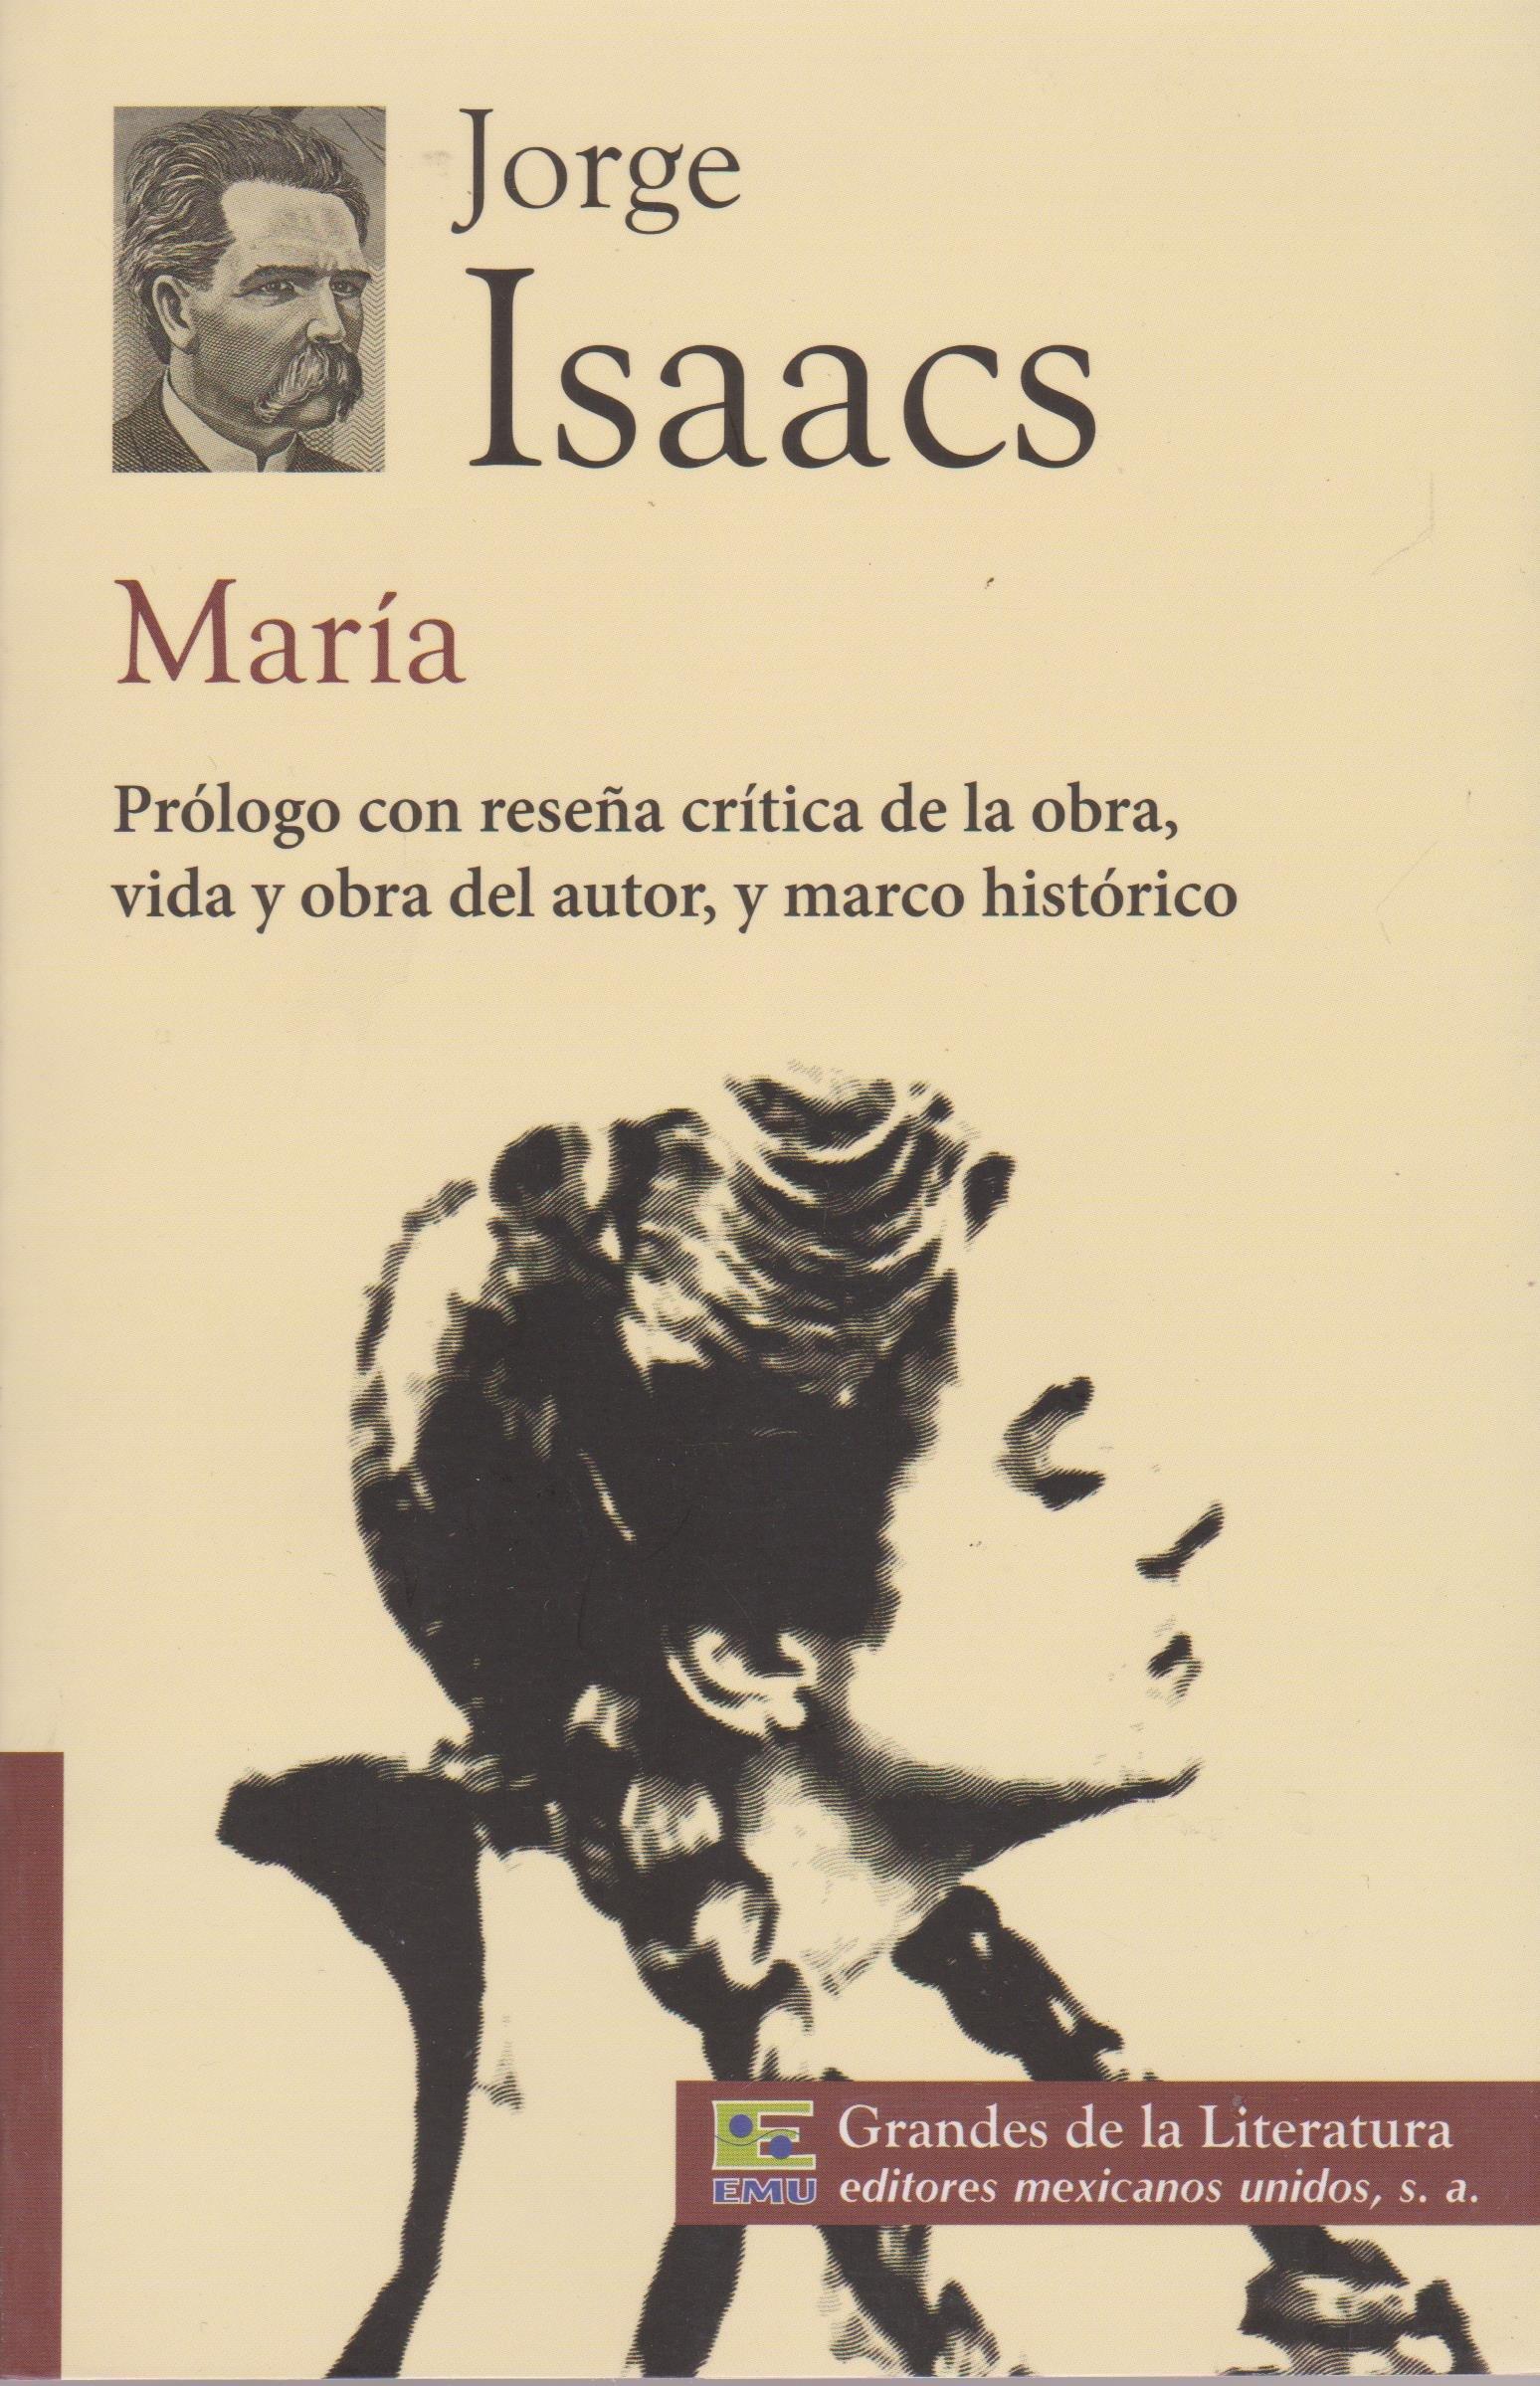 Maria. Prologo con resena critica de la obra, vida y obra del autor, y marco historico.: ISAACS, JORGE: Amazon.com.mx: Libros